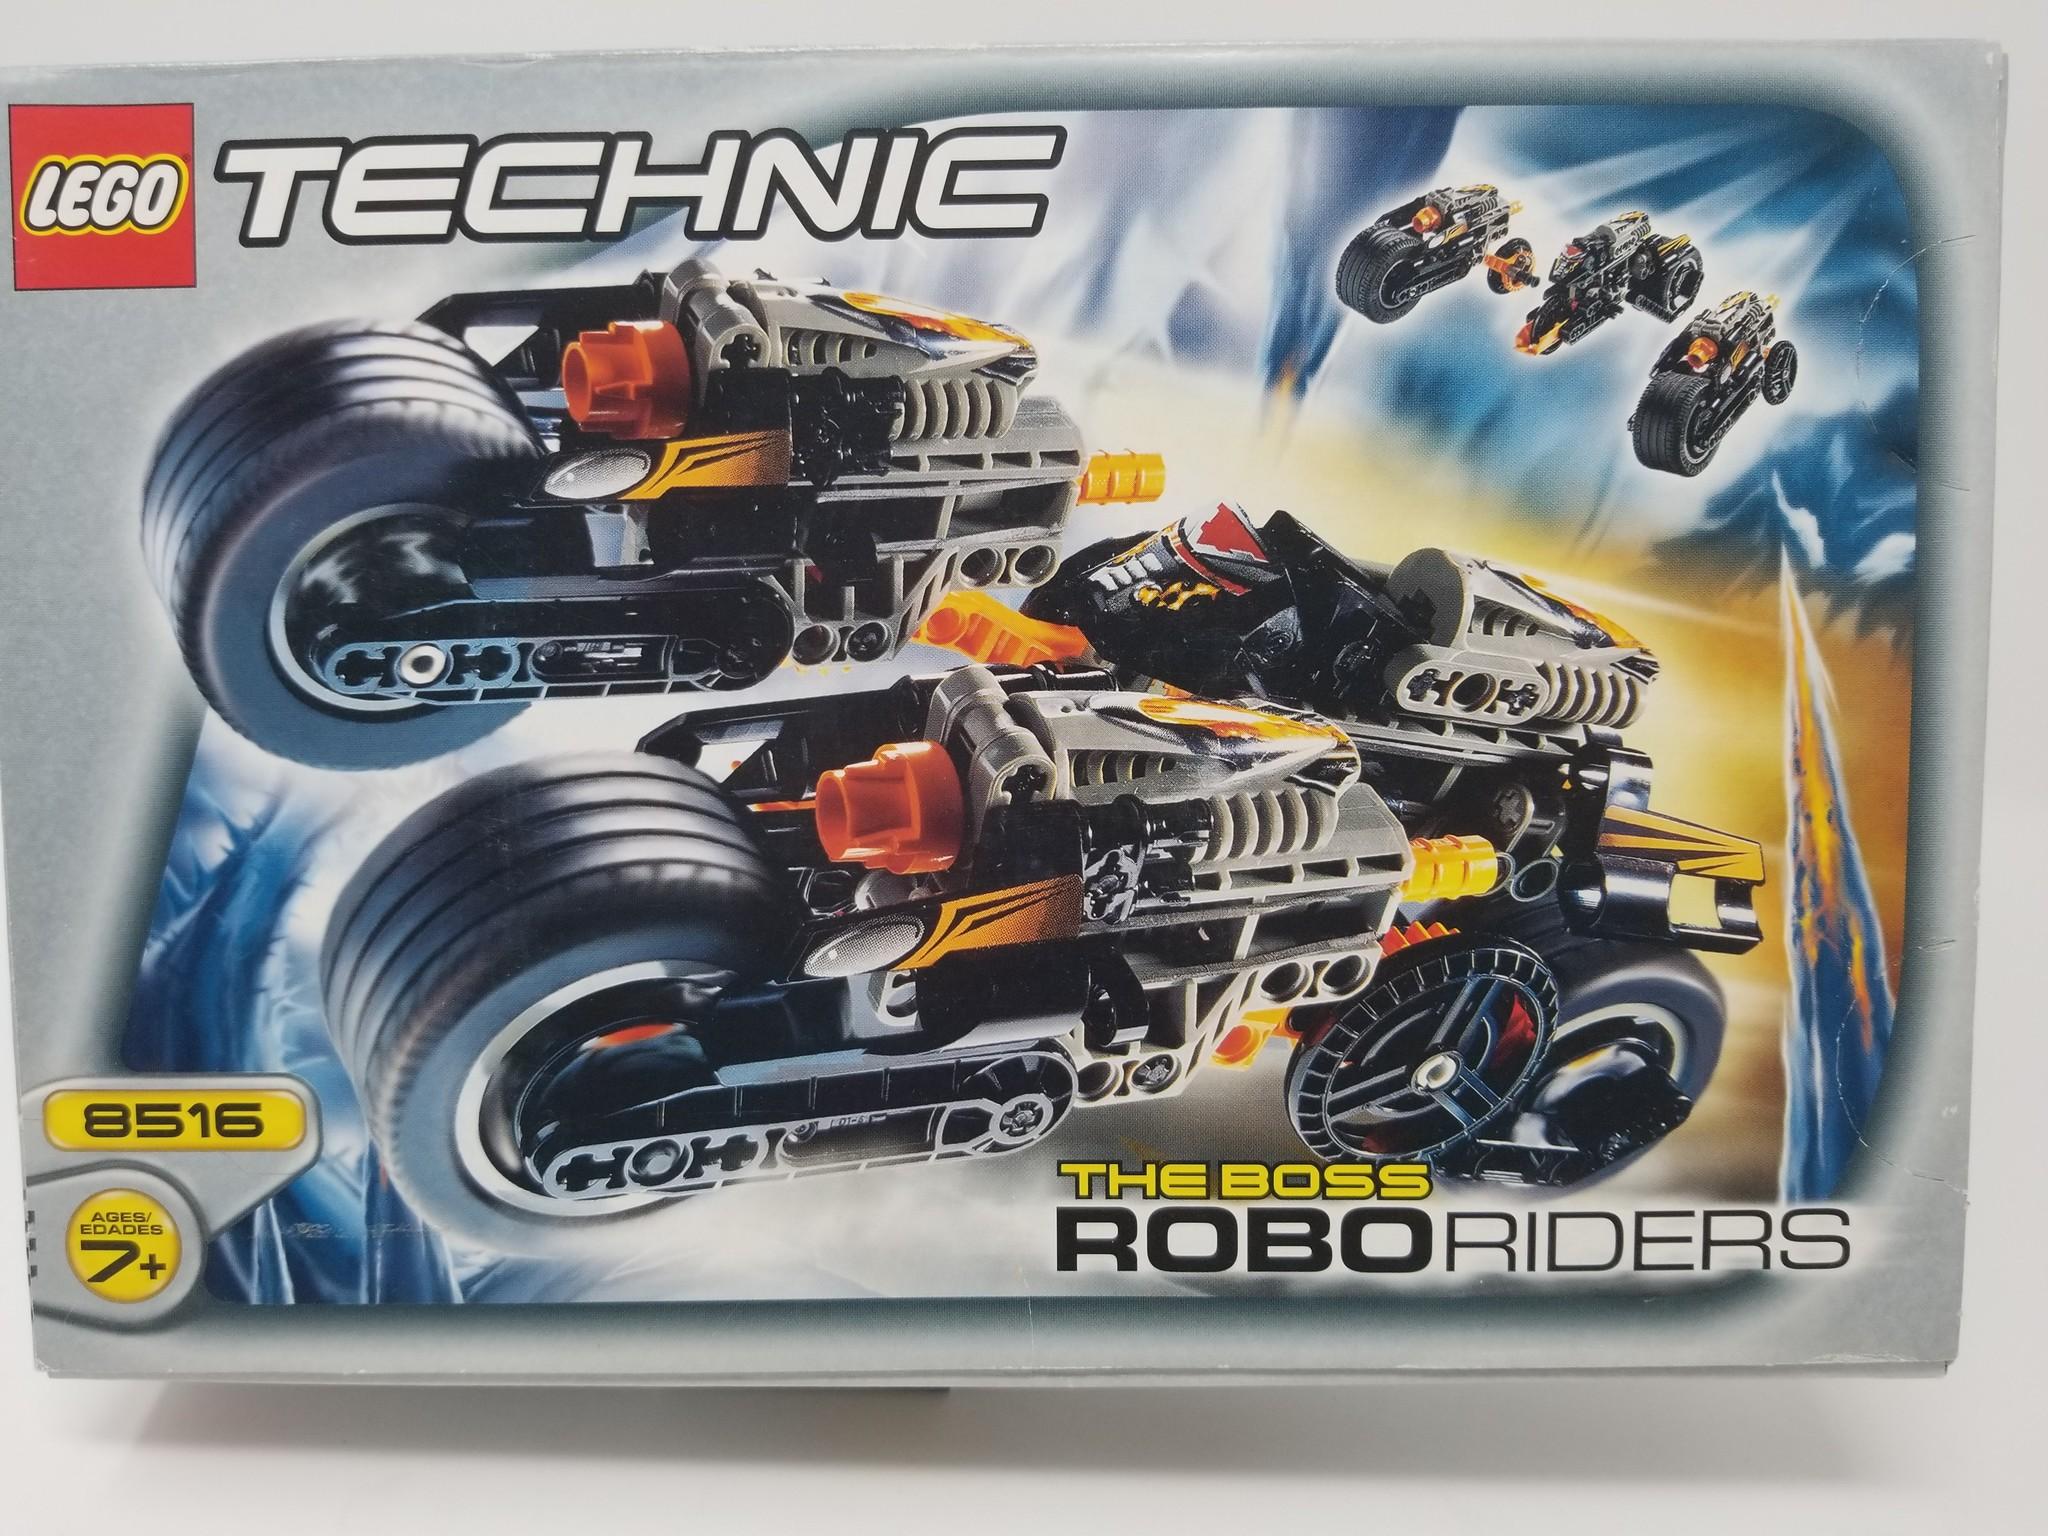 LEGO #8516 Technic: The Boss RoboRiders